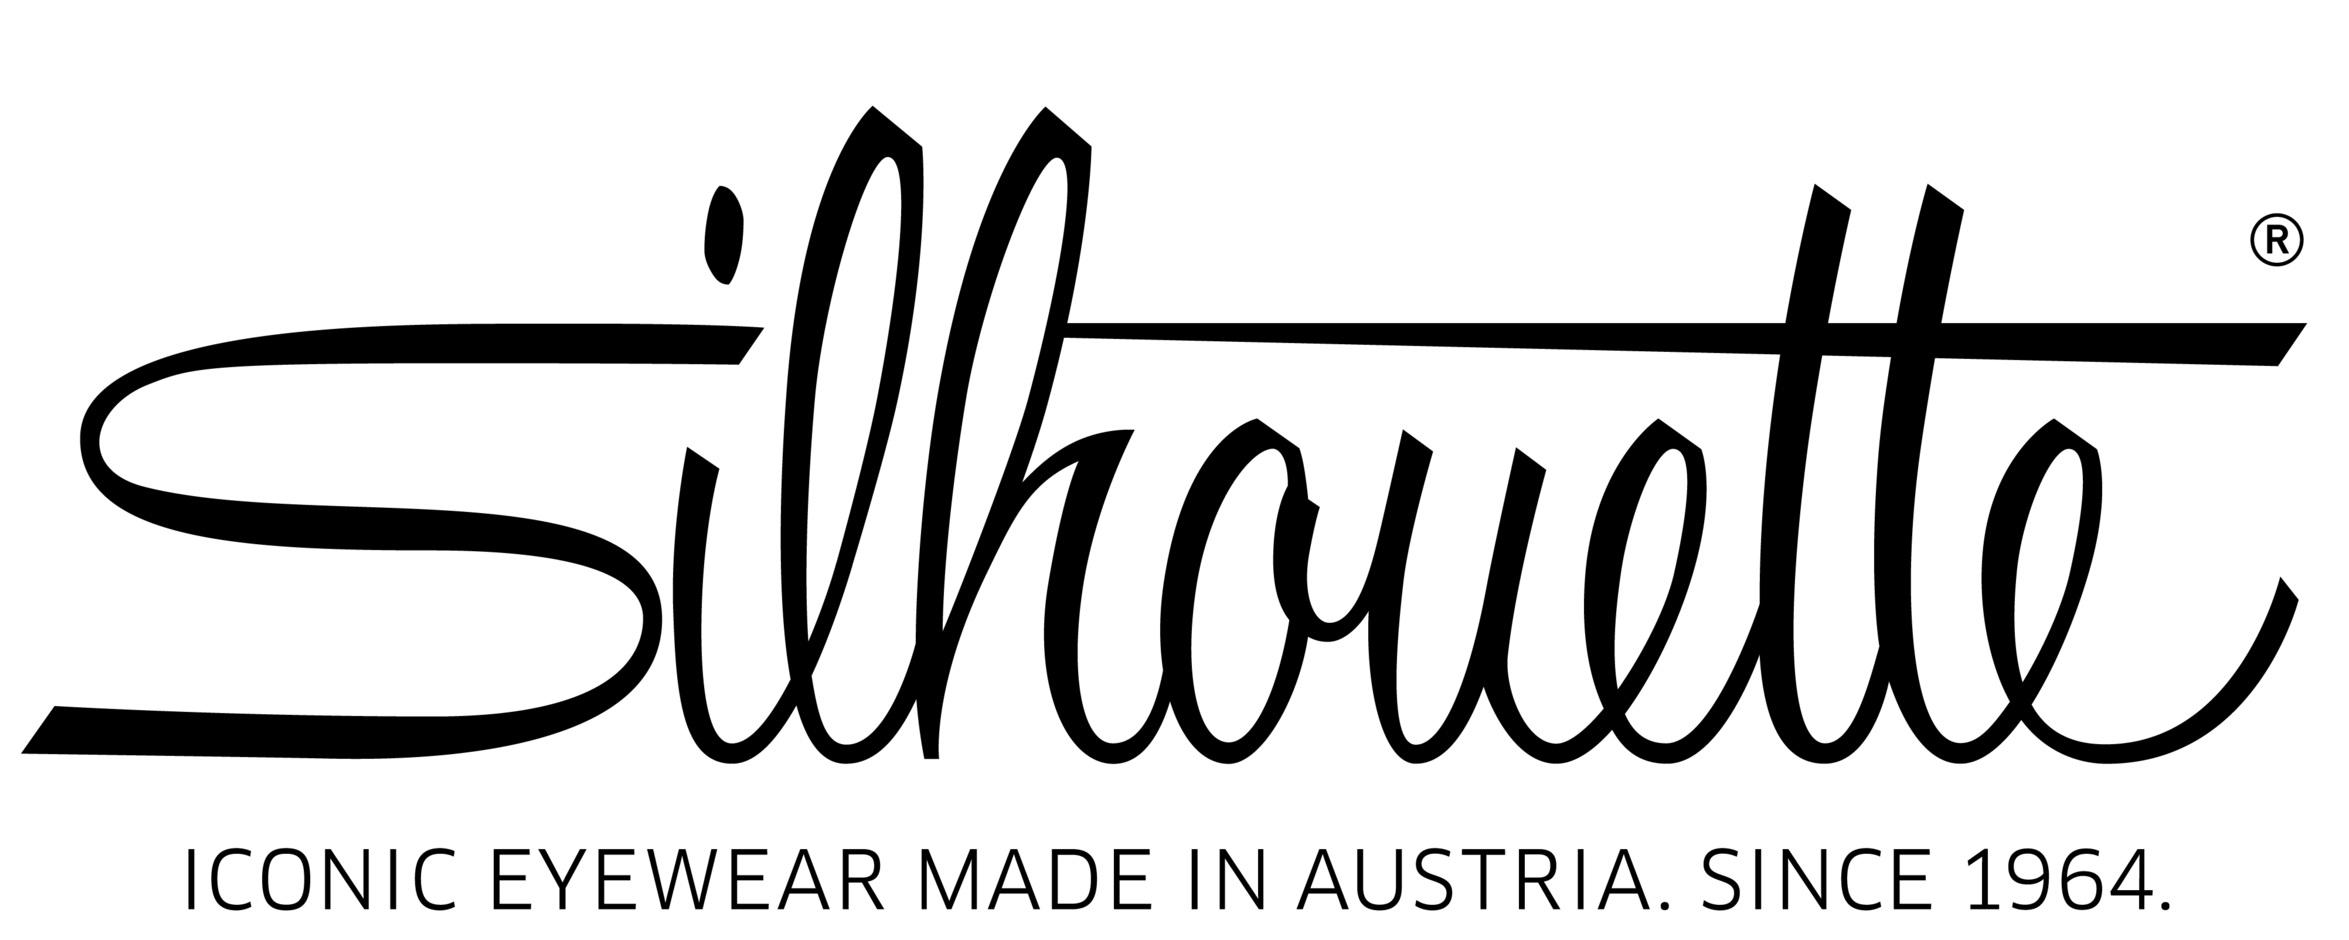 Silhouette_Iconic_Eyewear_Logo_Black_Transparent+Background+%281%29.jpg